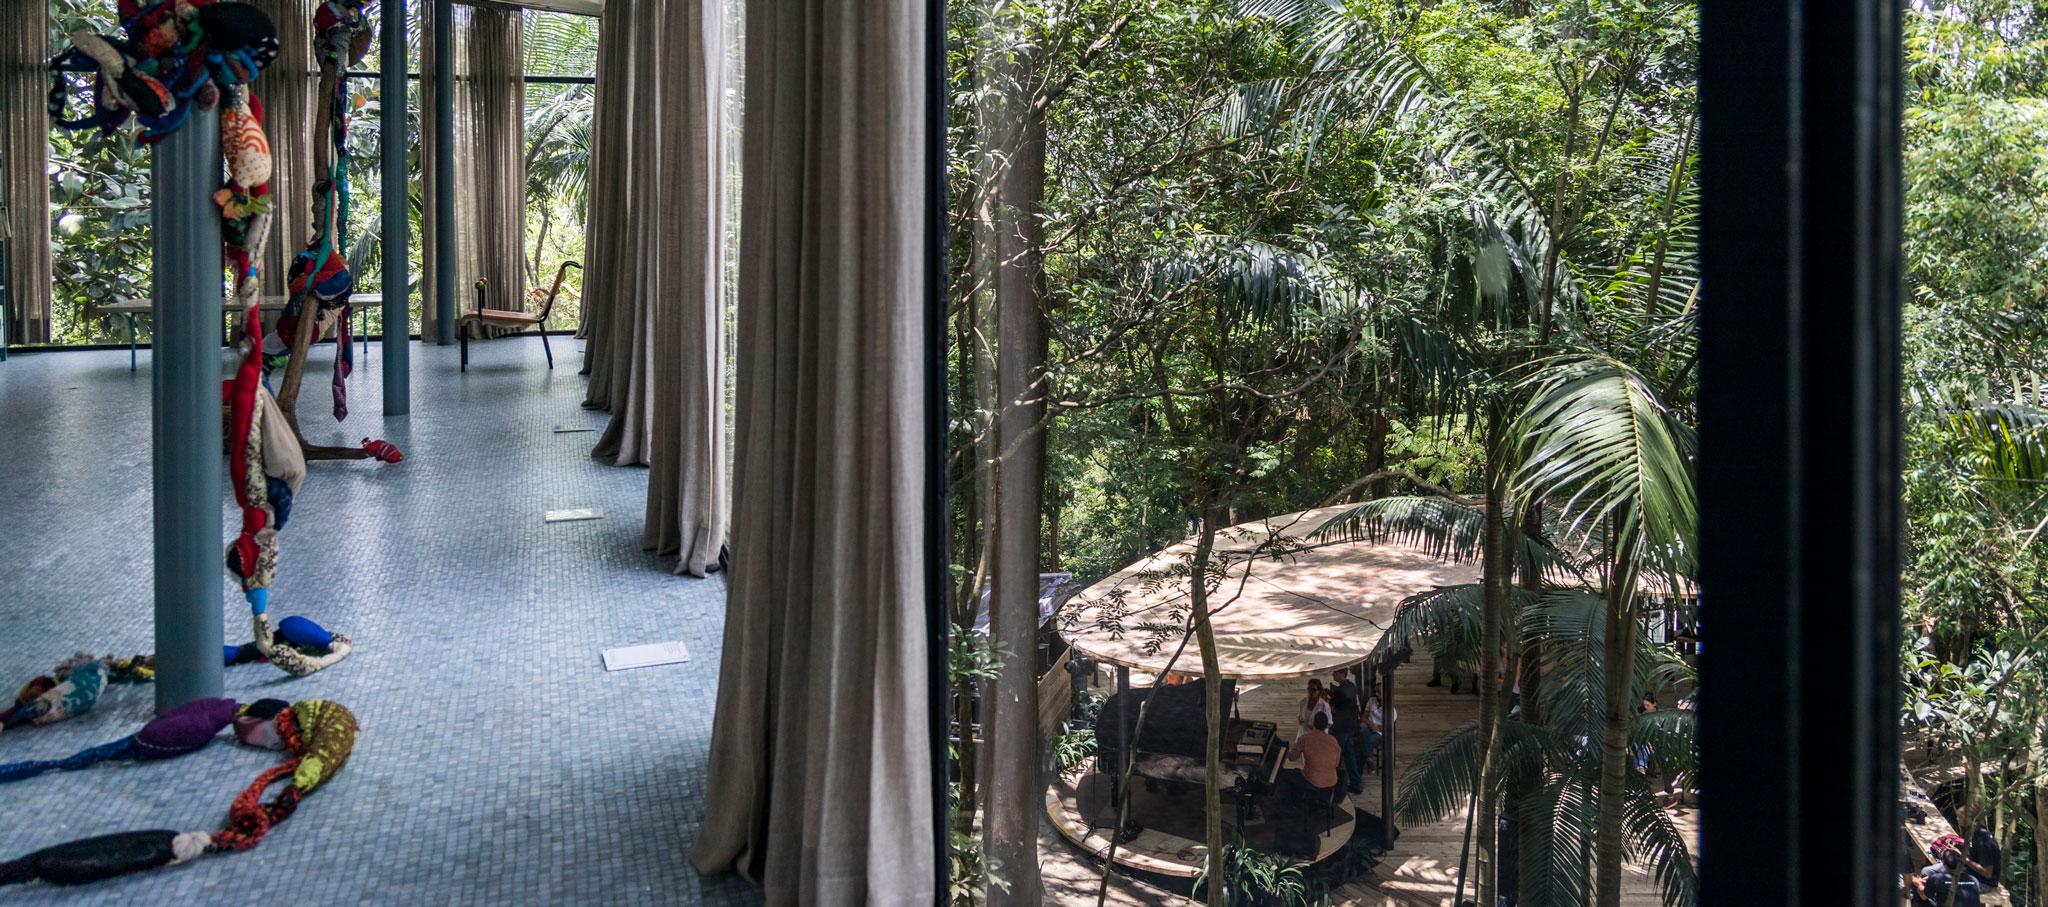 Pavilhão de Verão (Pabellón de verano) en la Casa de Vidro por Raddar Architecture. Fotografía por Simon Plestenjak